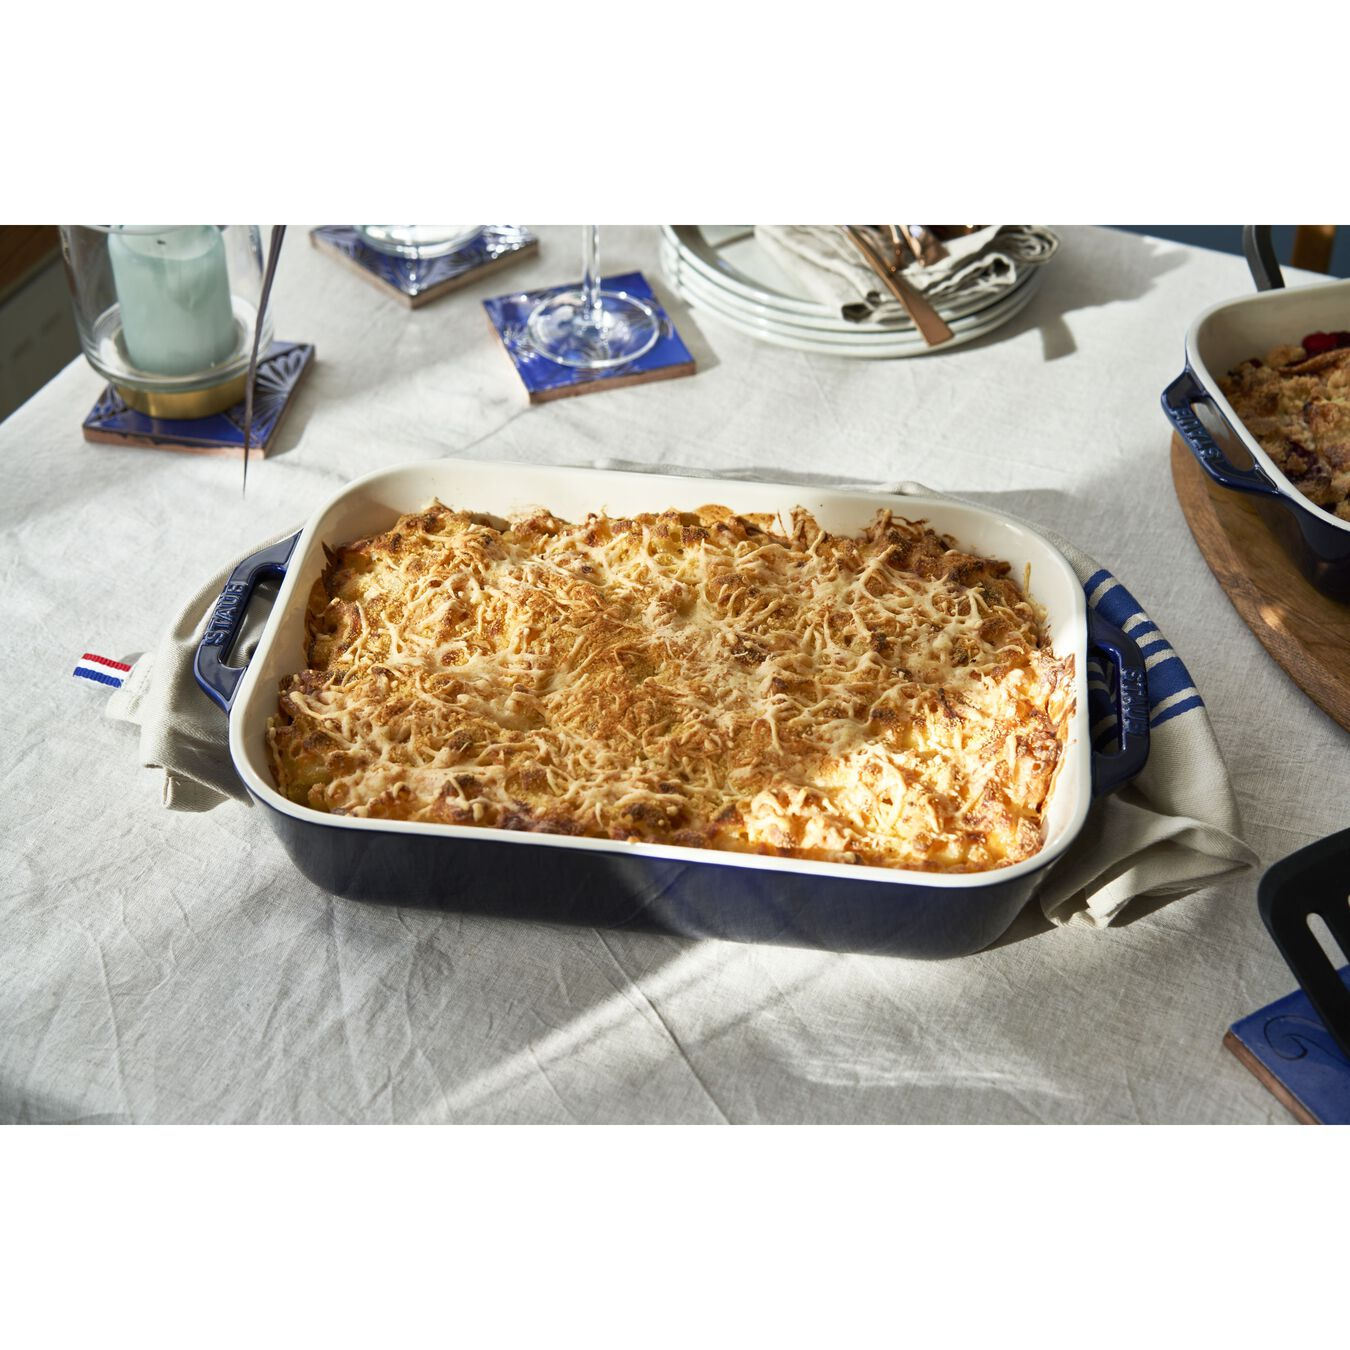 13-inch x 9-inch Rectangular Baking Dish - Dark Blue,,large 2